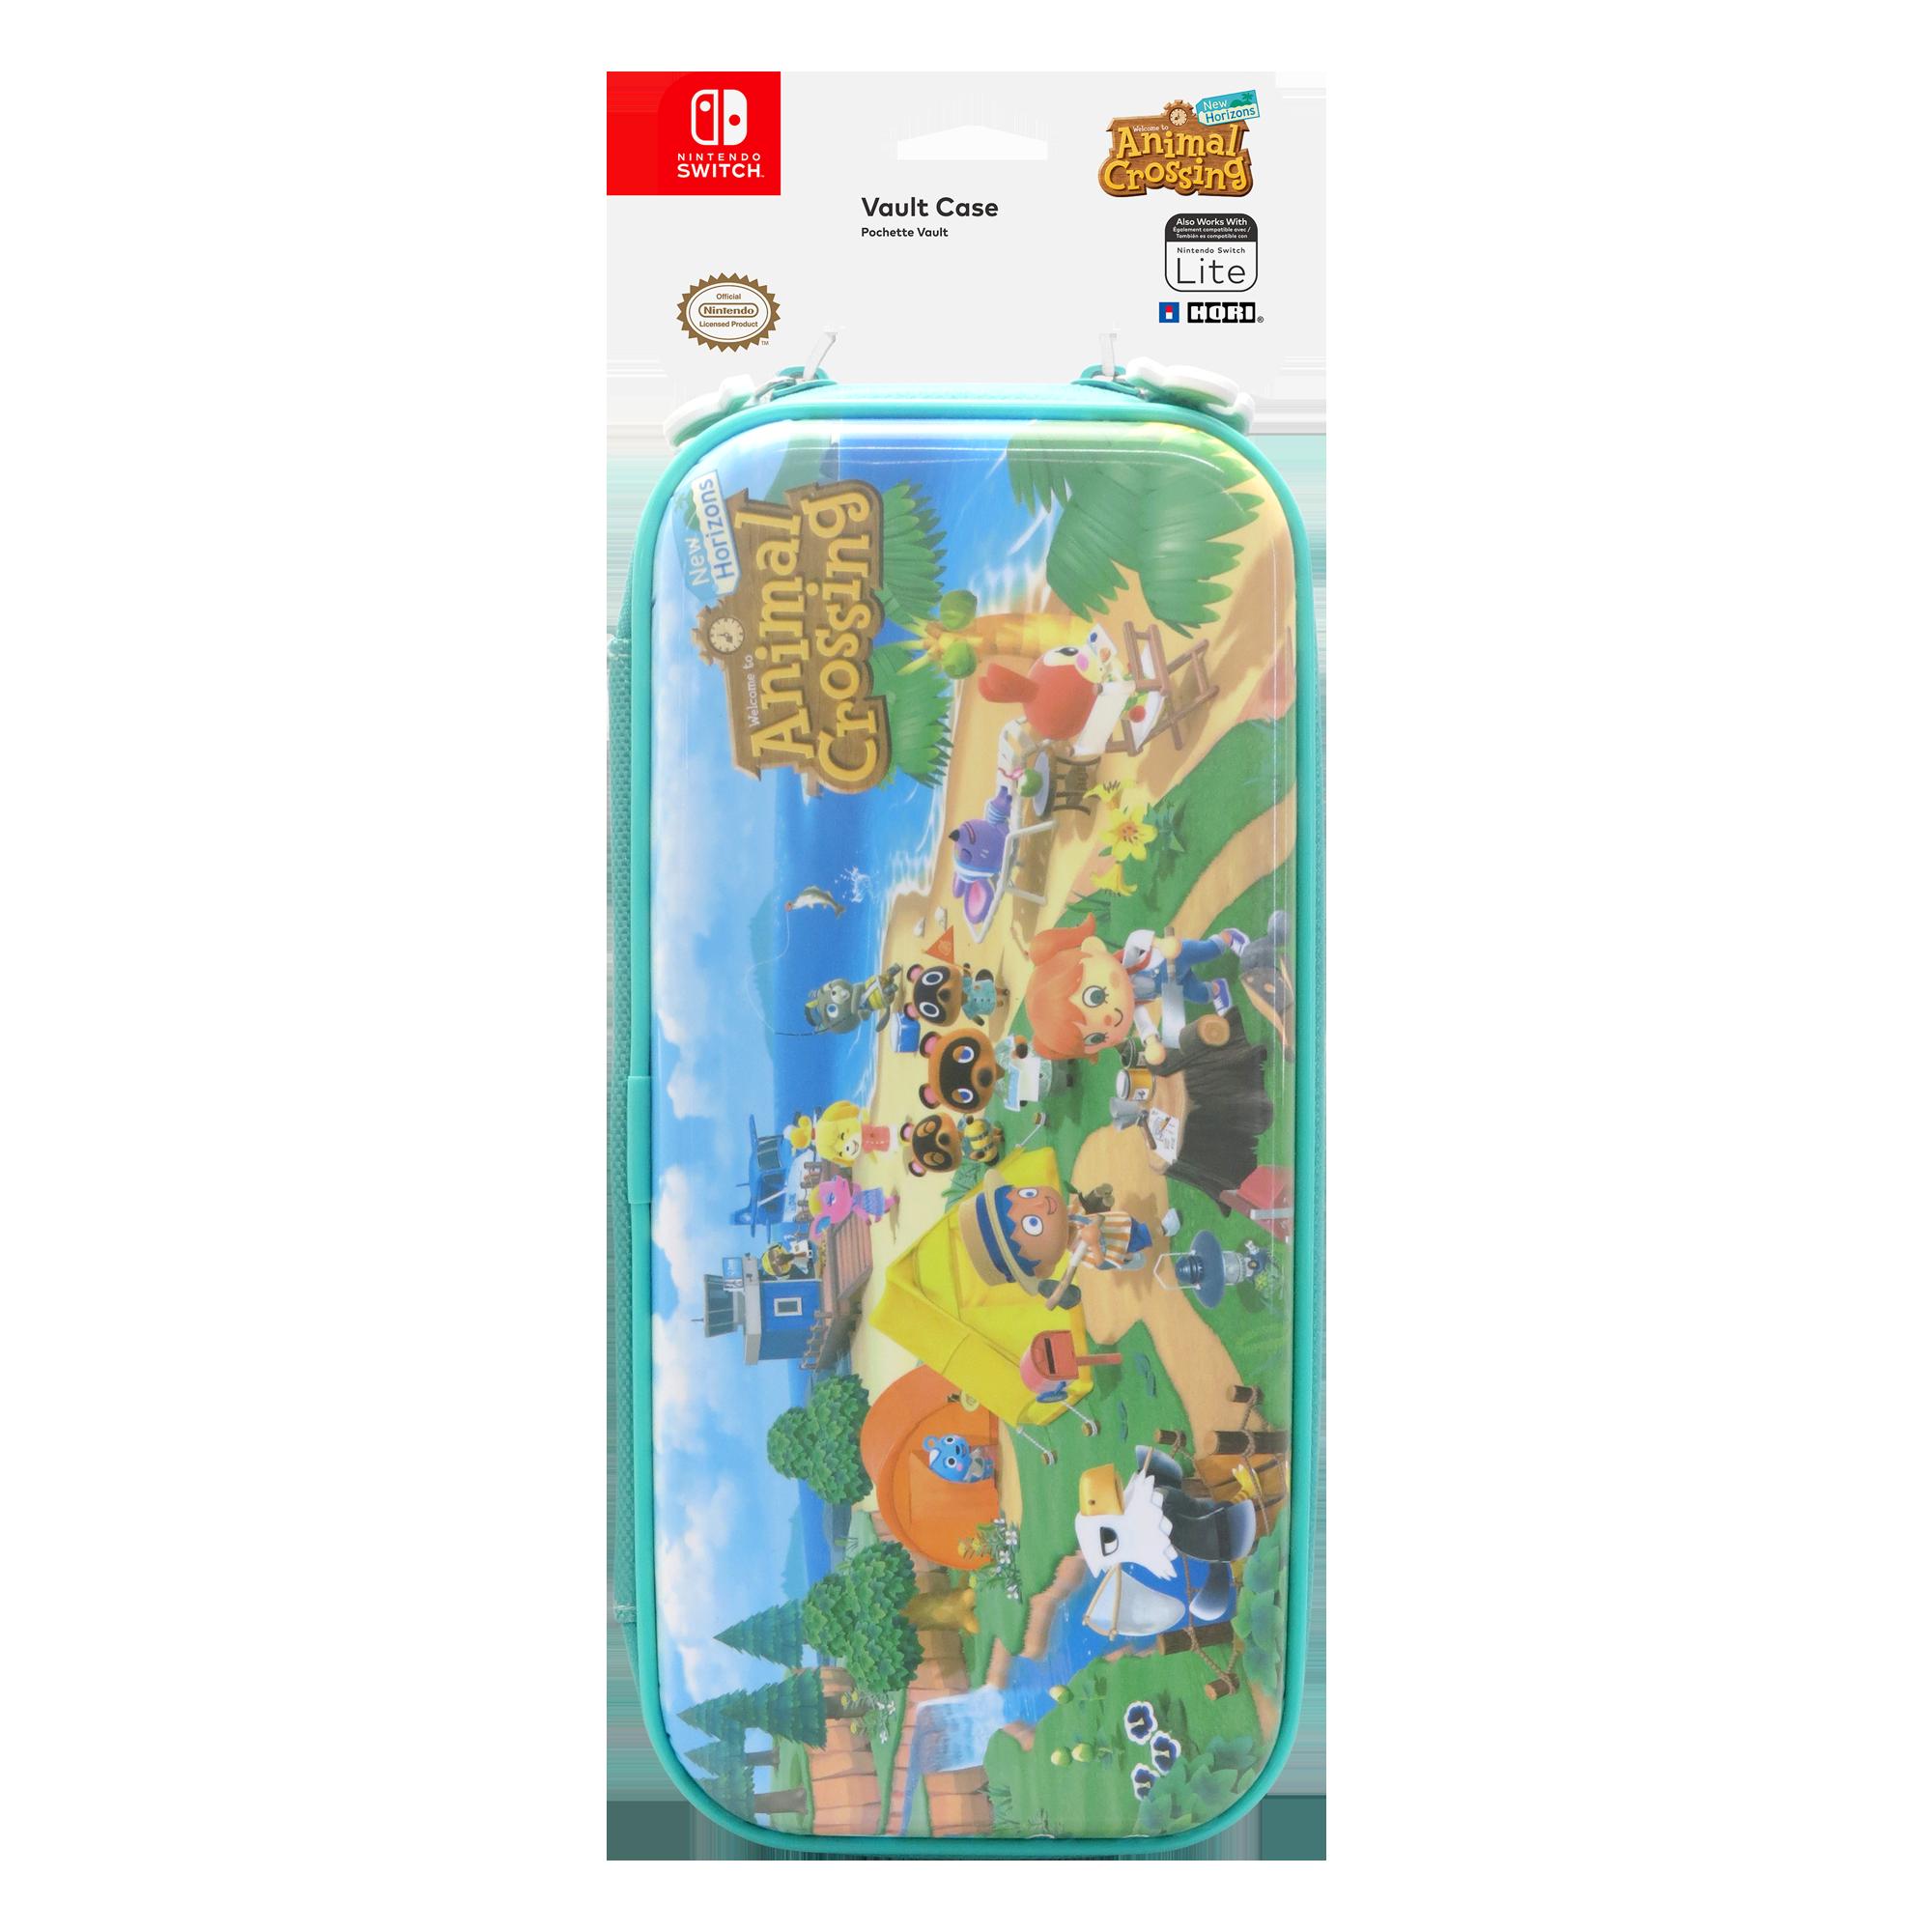 Premium Vault Case With Animal Crossing Design For Nintendo Switch Or Nintendo Switch Lite Hori 873124008760